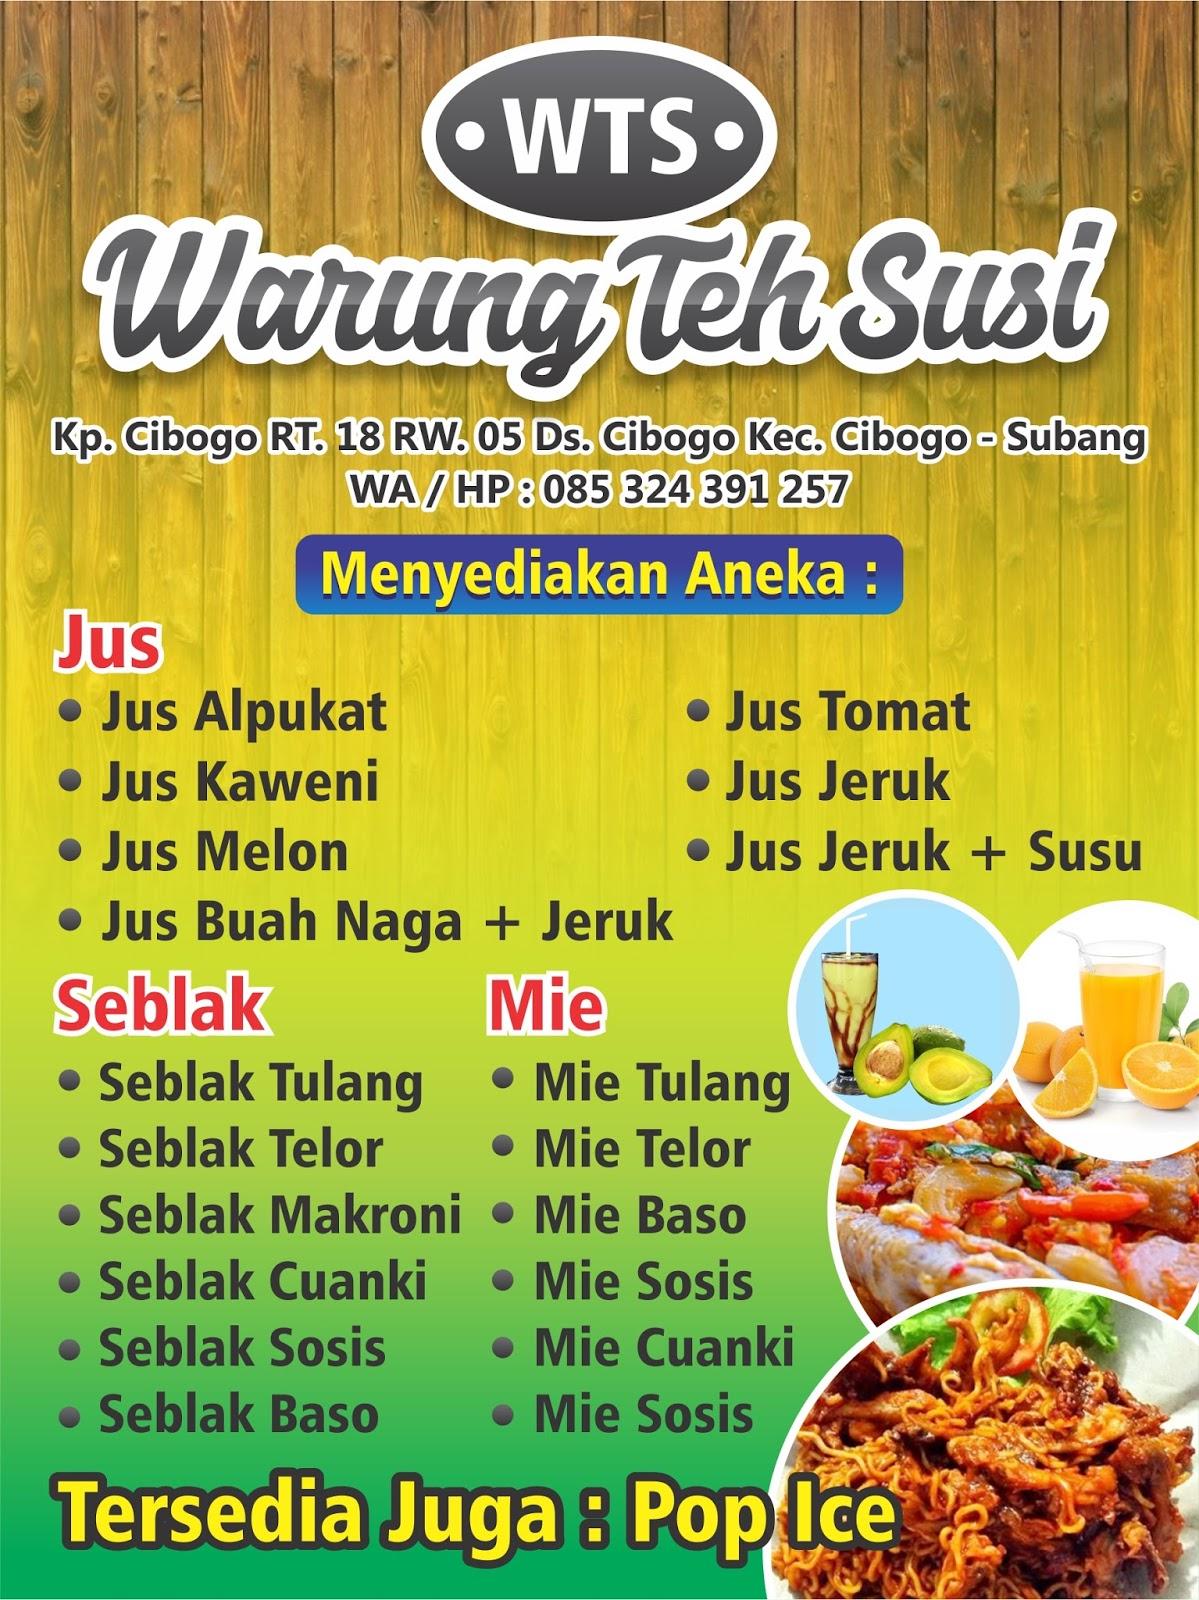 Contoh Banner Warung Seblak